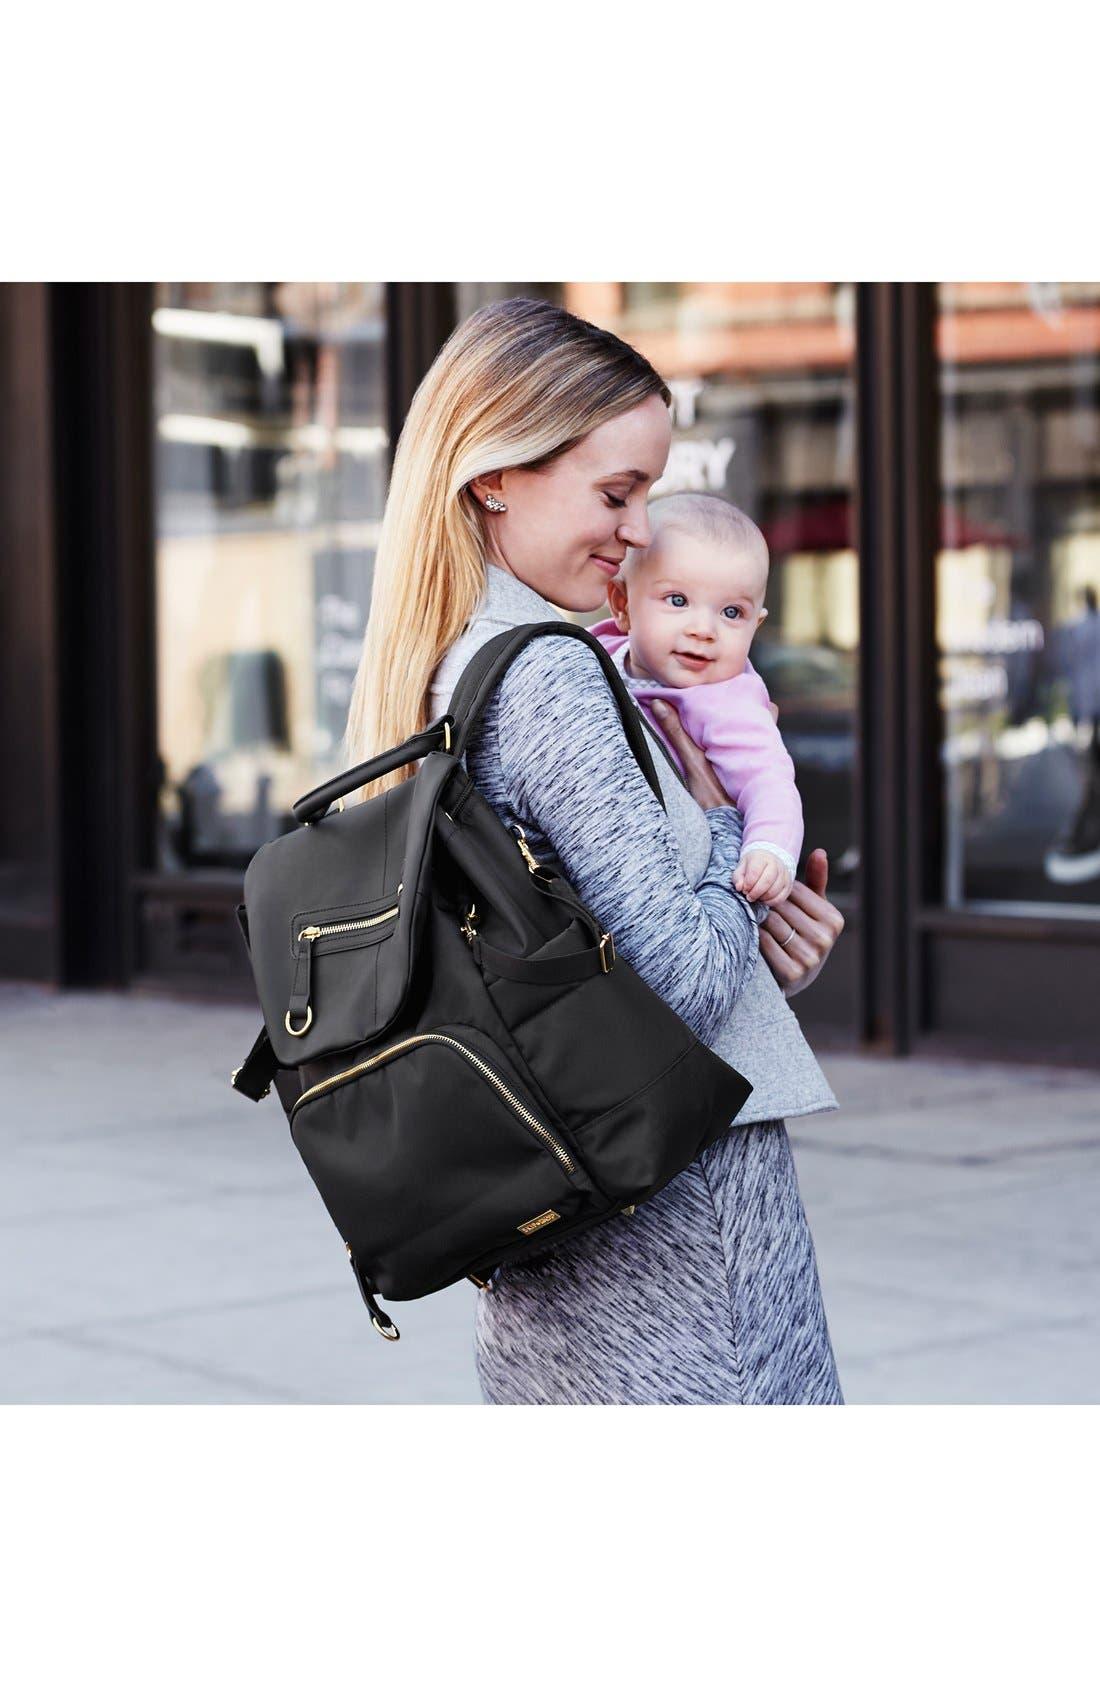 'Chelsea' Diaper Bag Backpack,                             Alternate thumbnail 9, color,                             BLACK